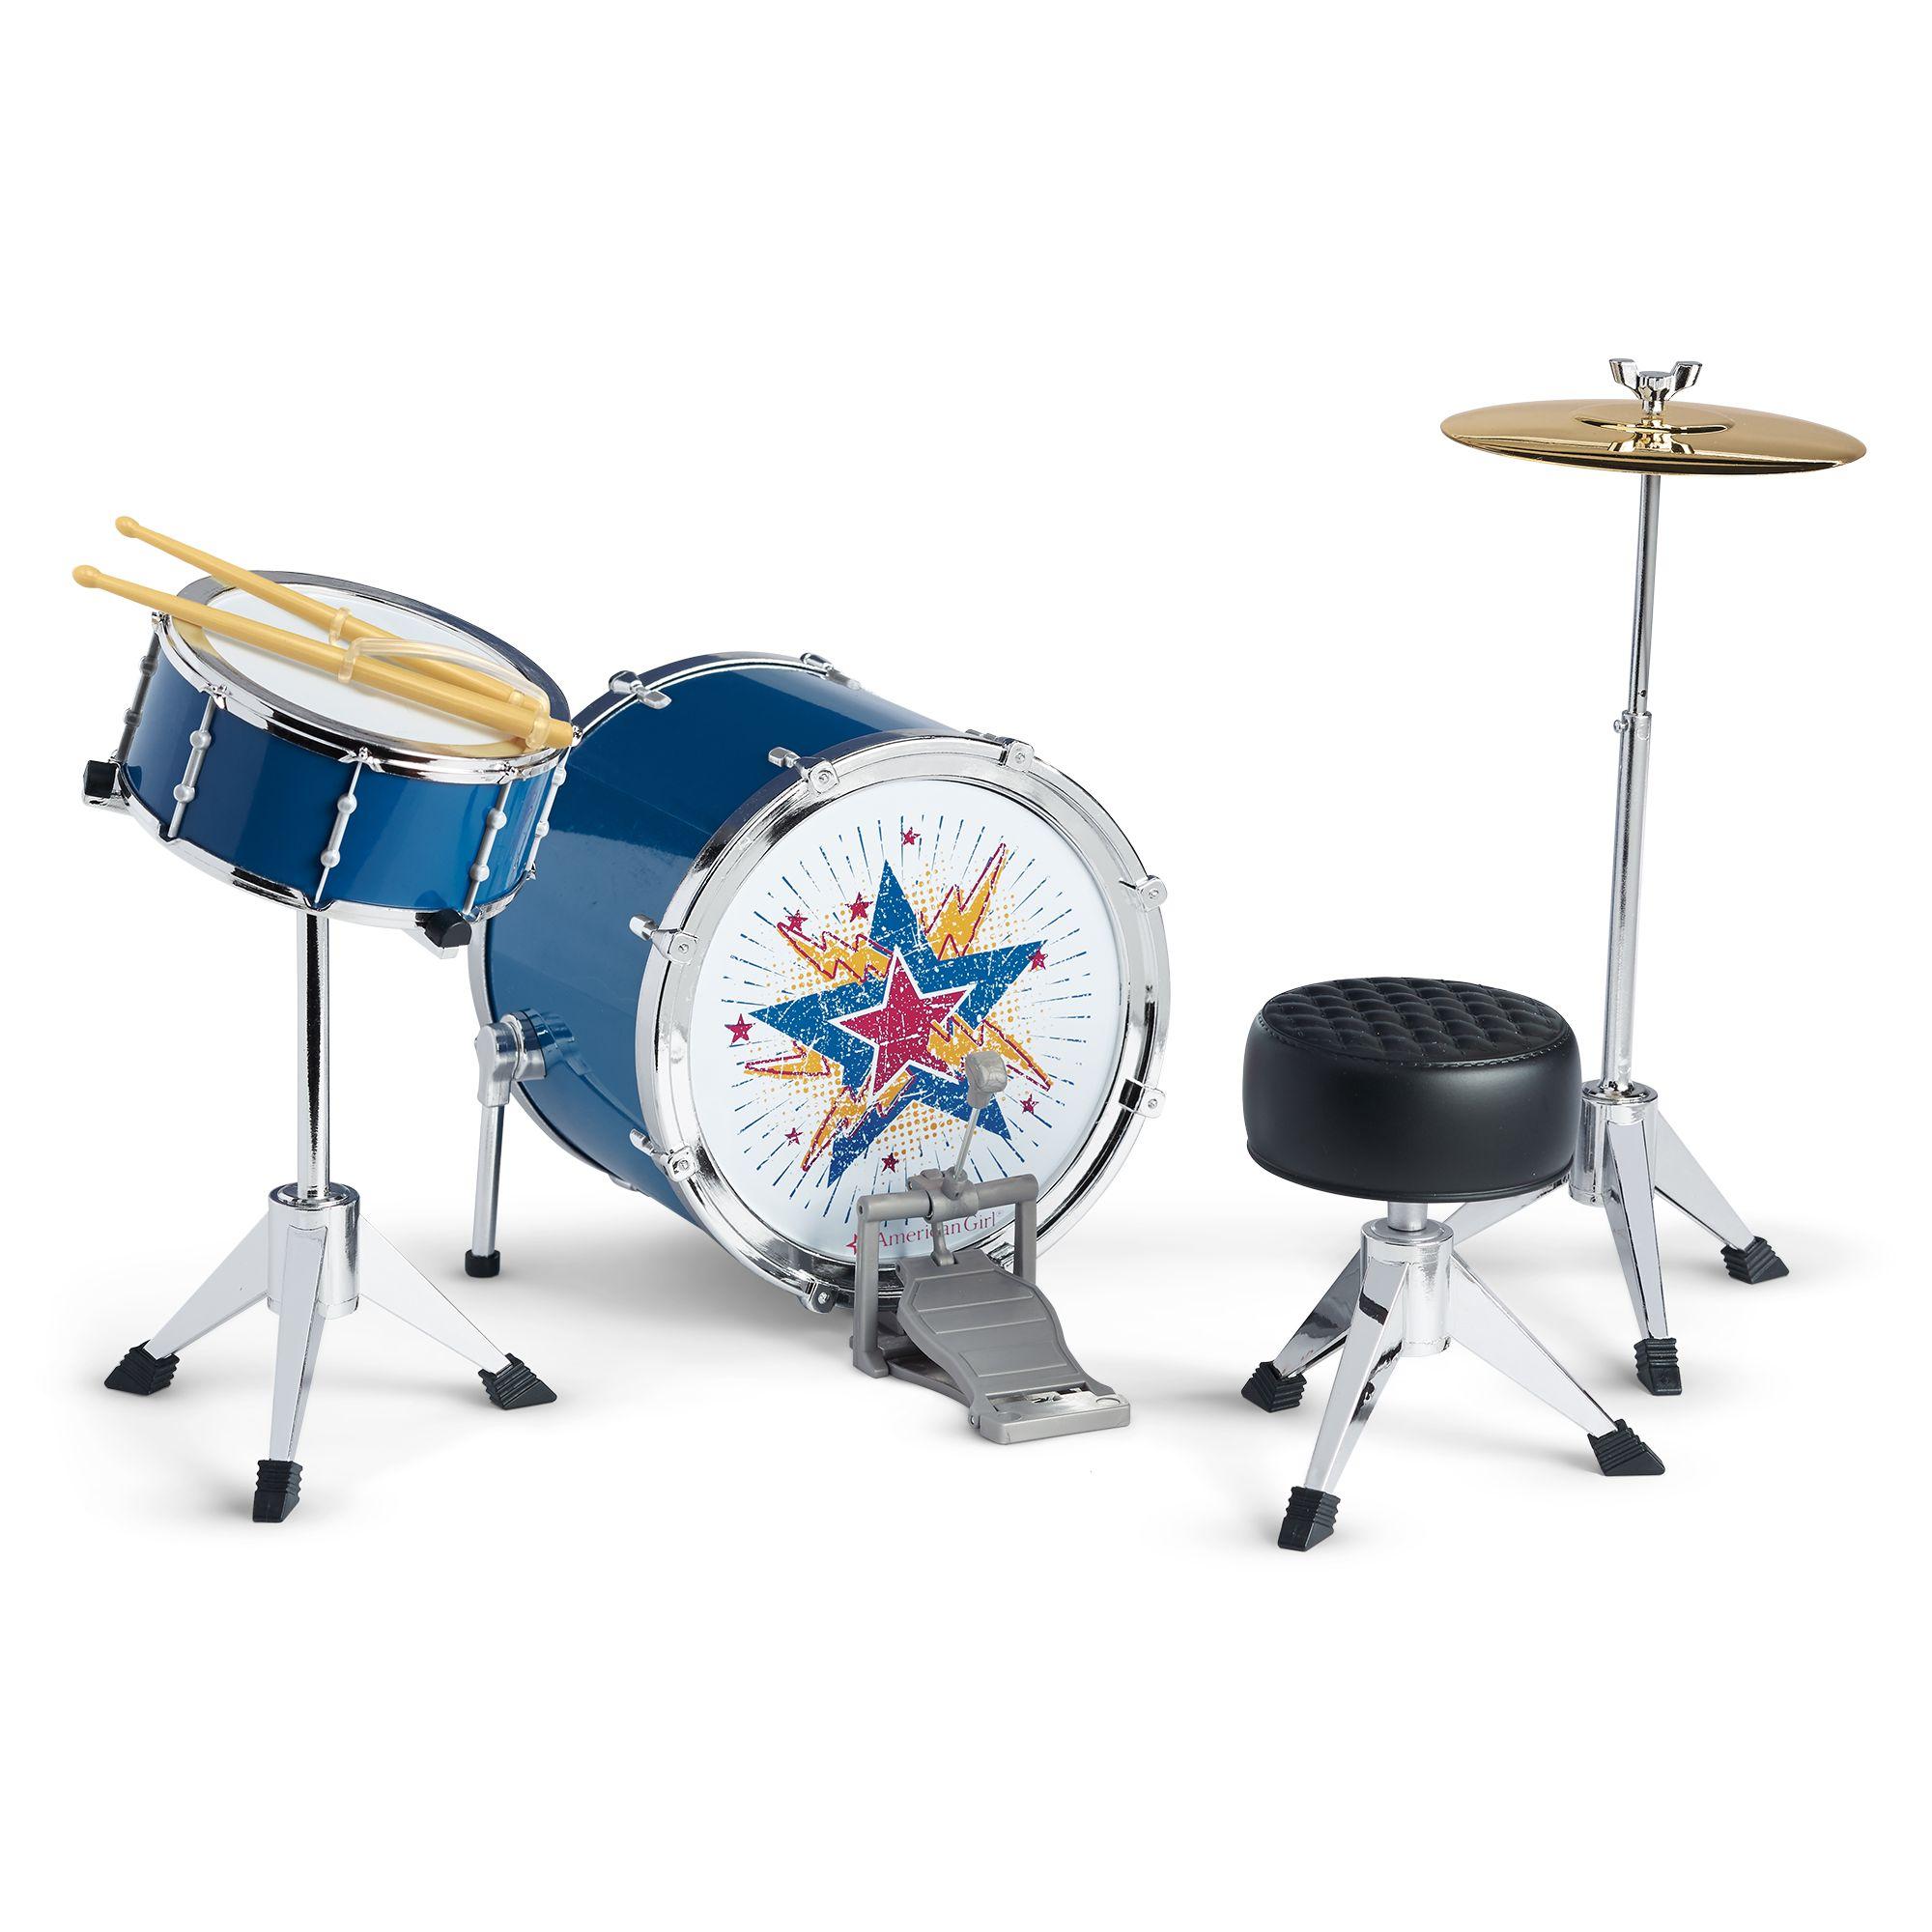 logan 39 s rhythmic drum set american girl wiki fandom powered by wikia. Black Bedroom Furniture Sets. Home Design Ideas